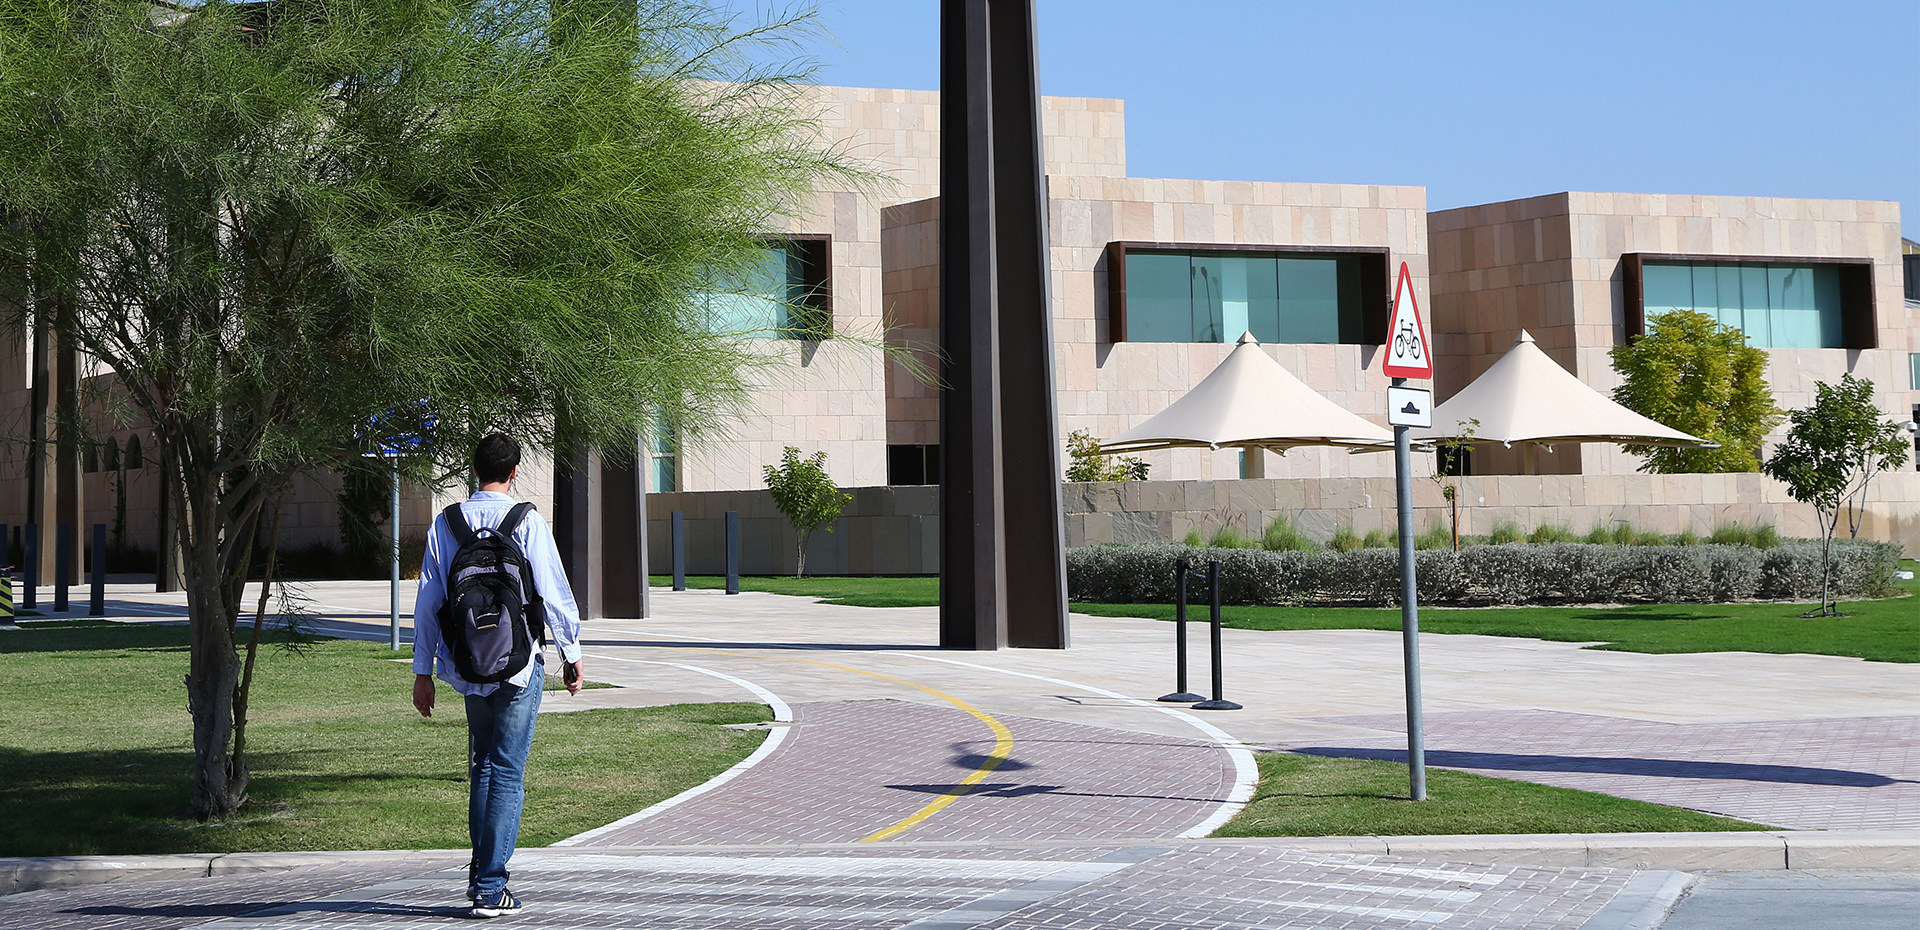 Education city student center